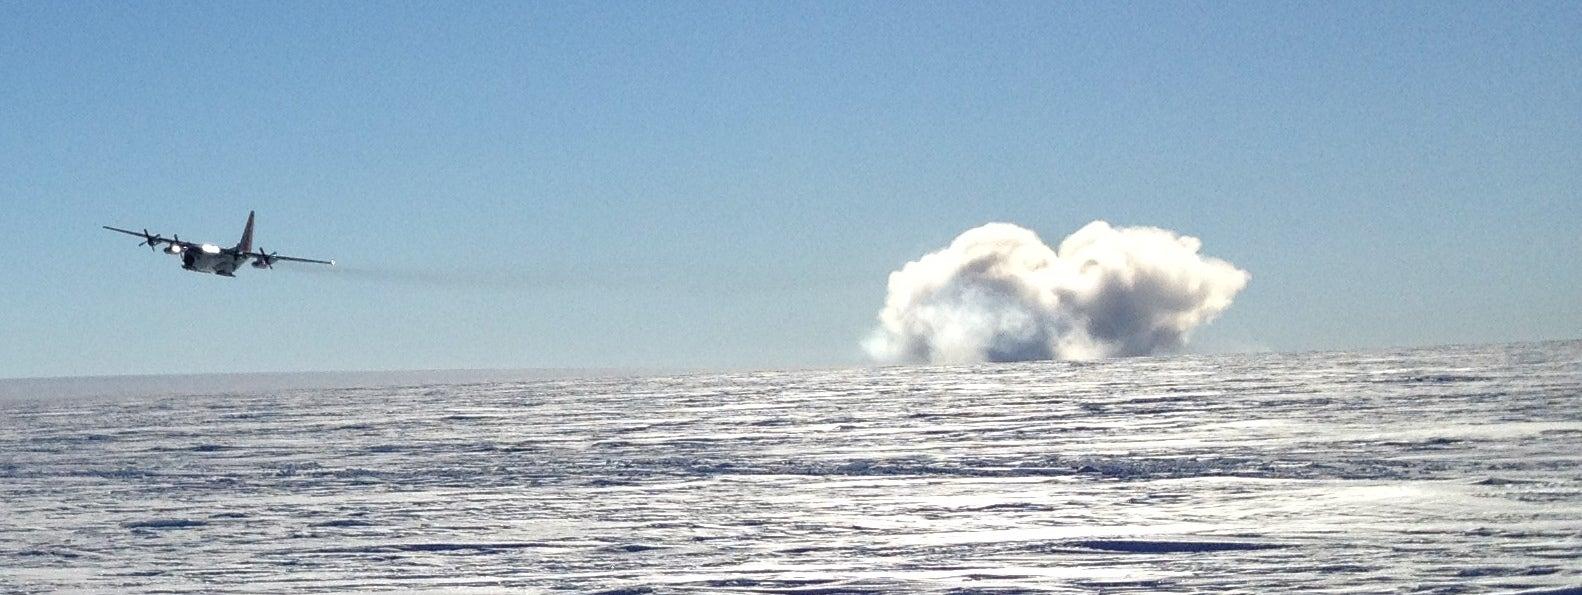 A Season In Antarctica